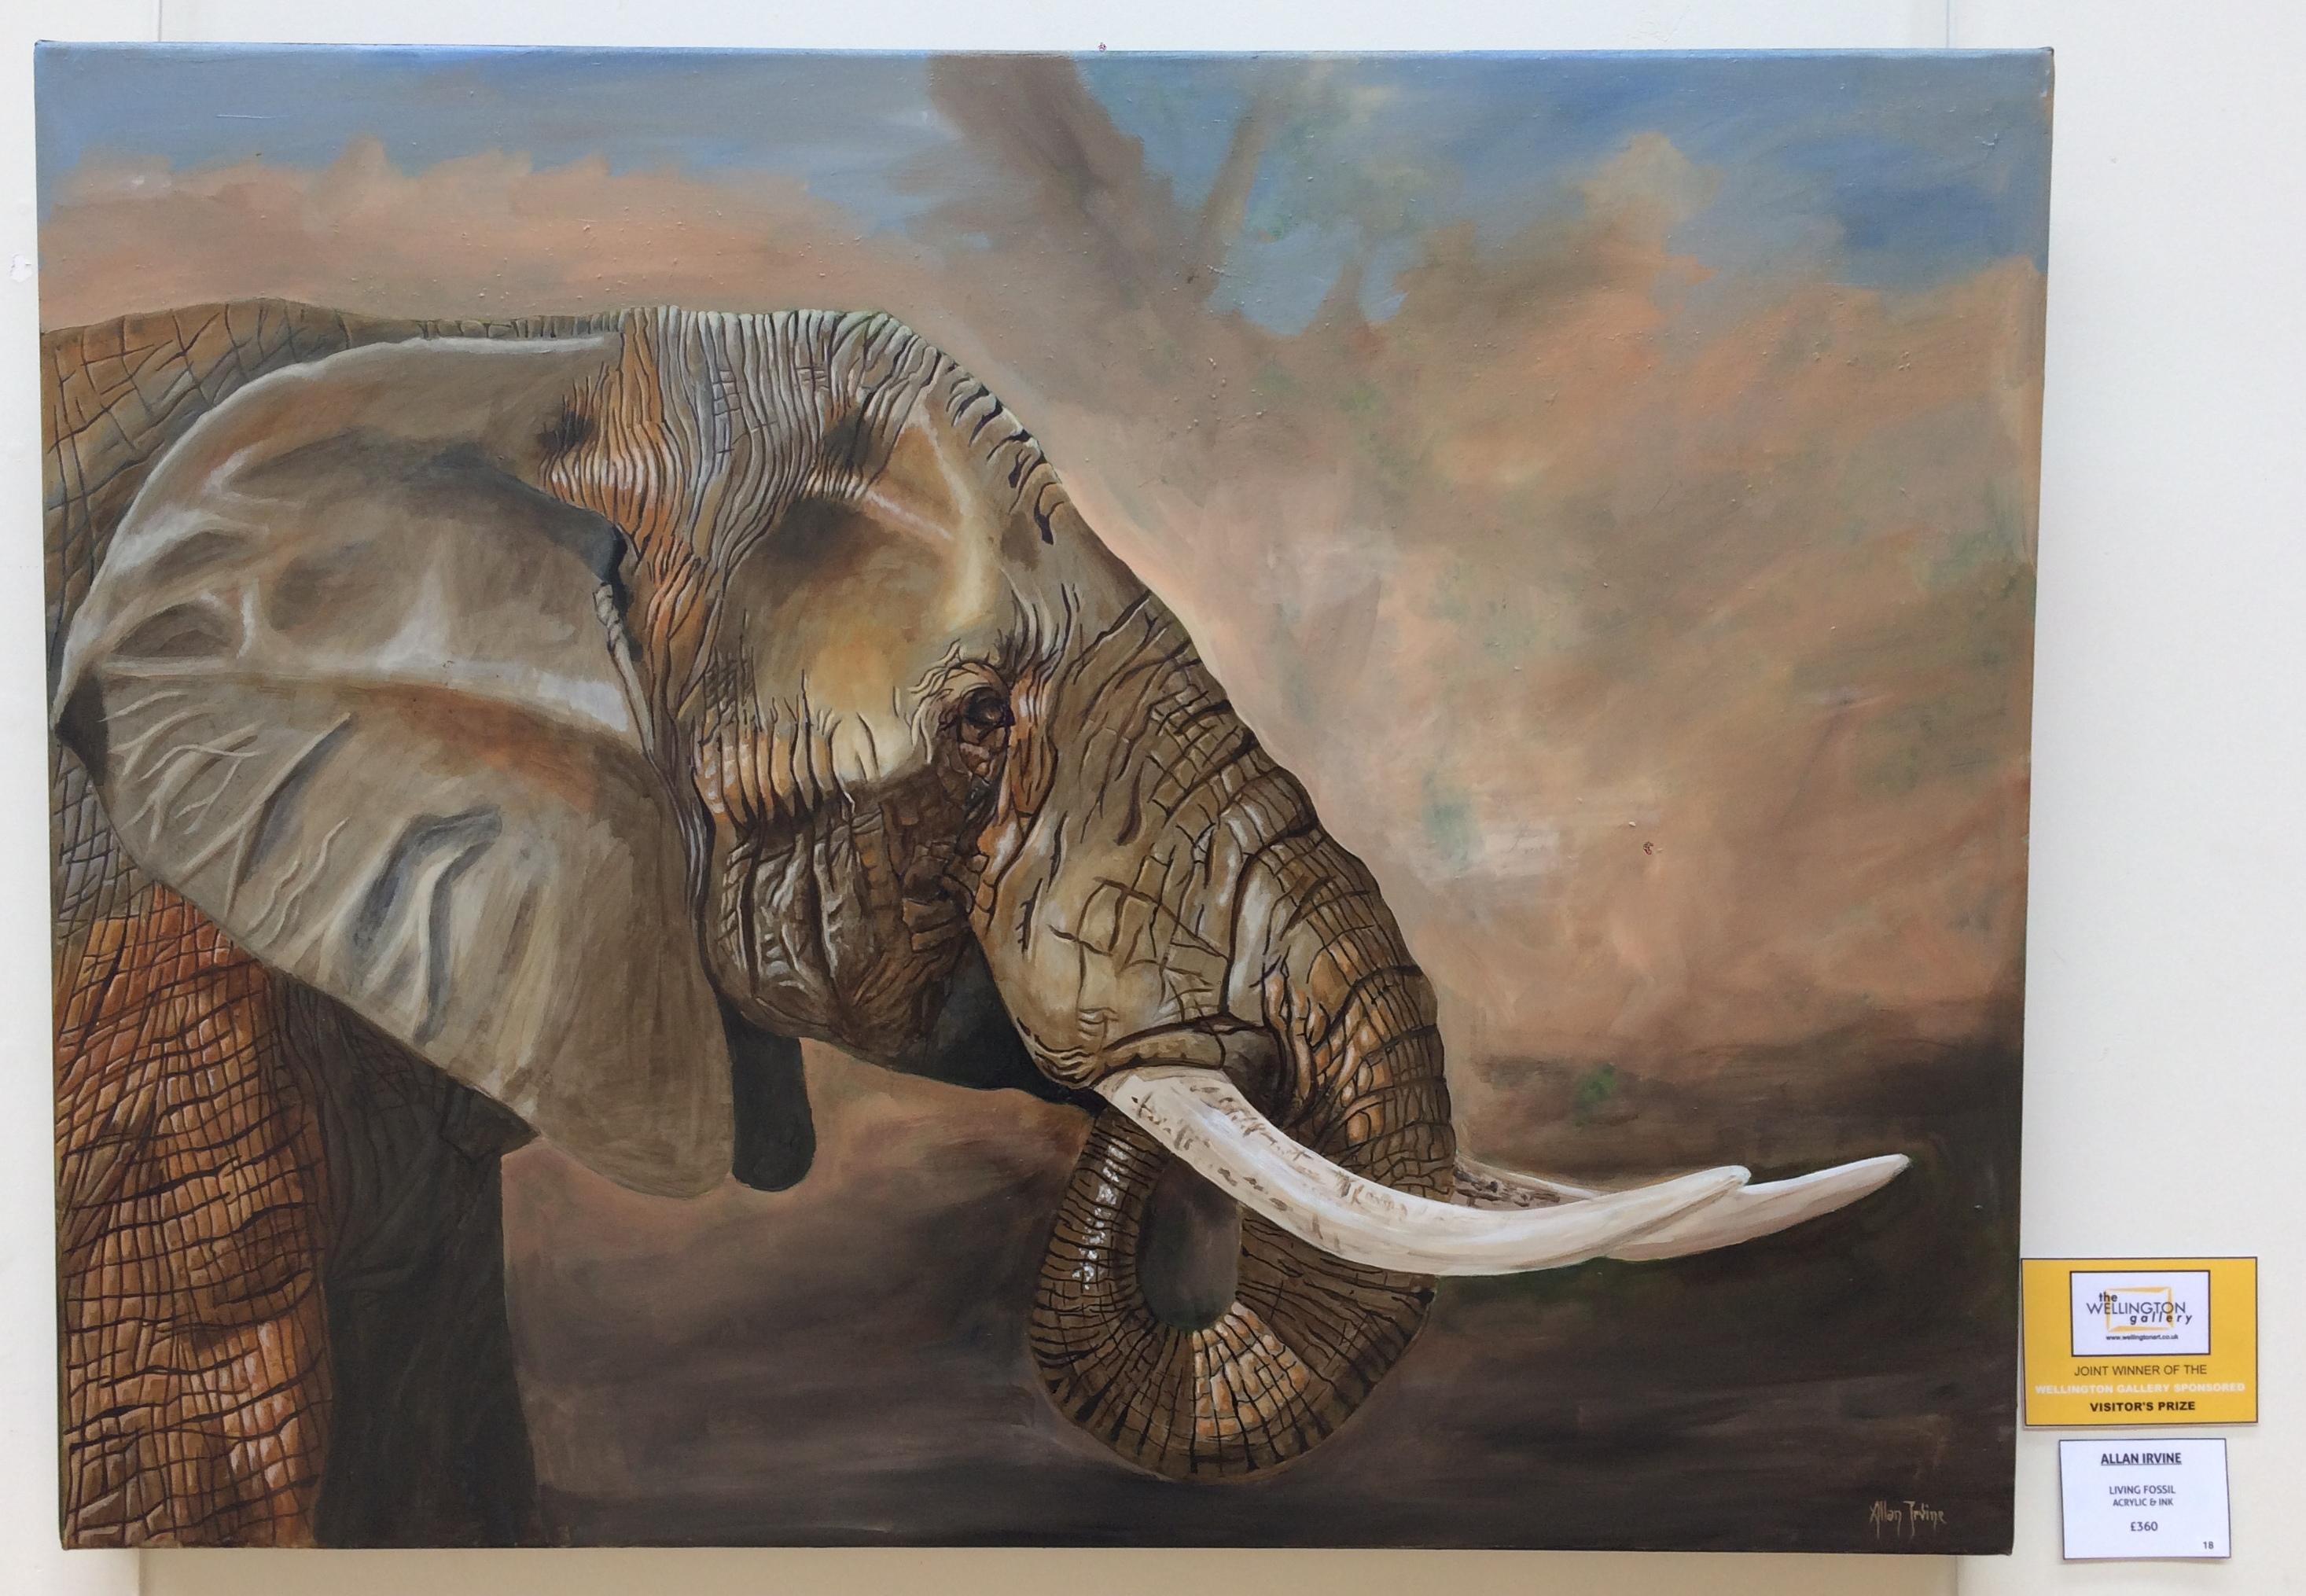 Allan Irvine, Living Fossil